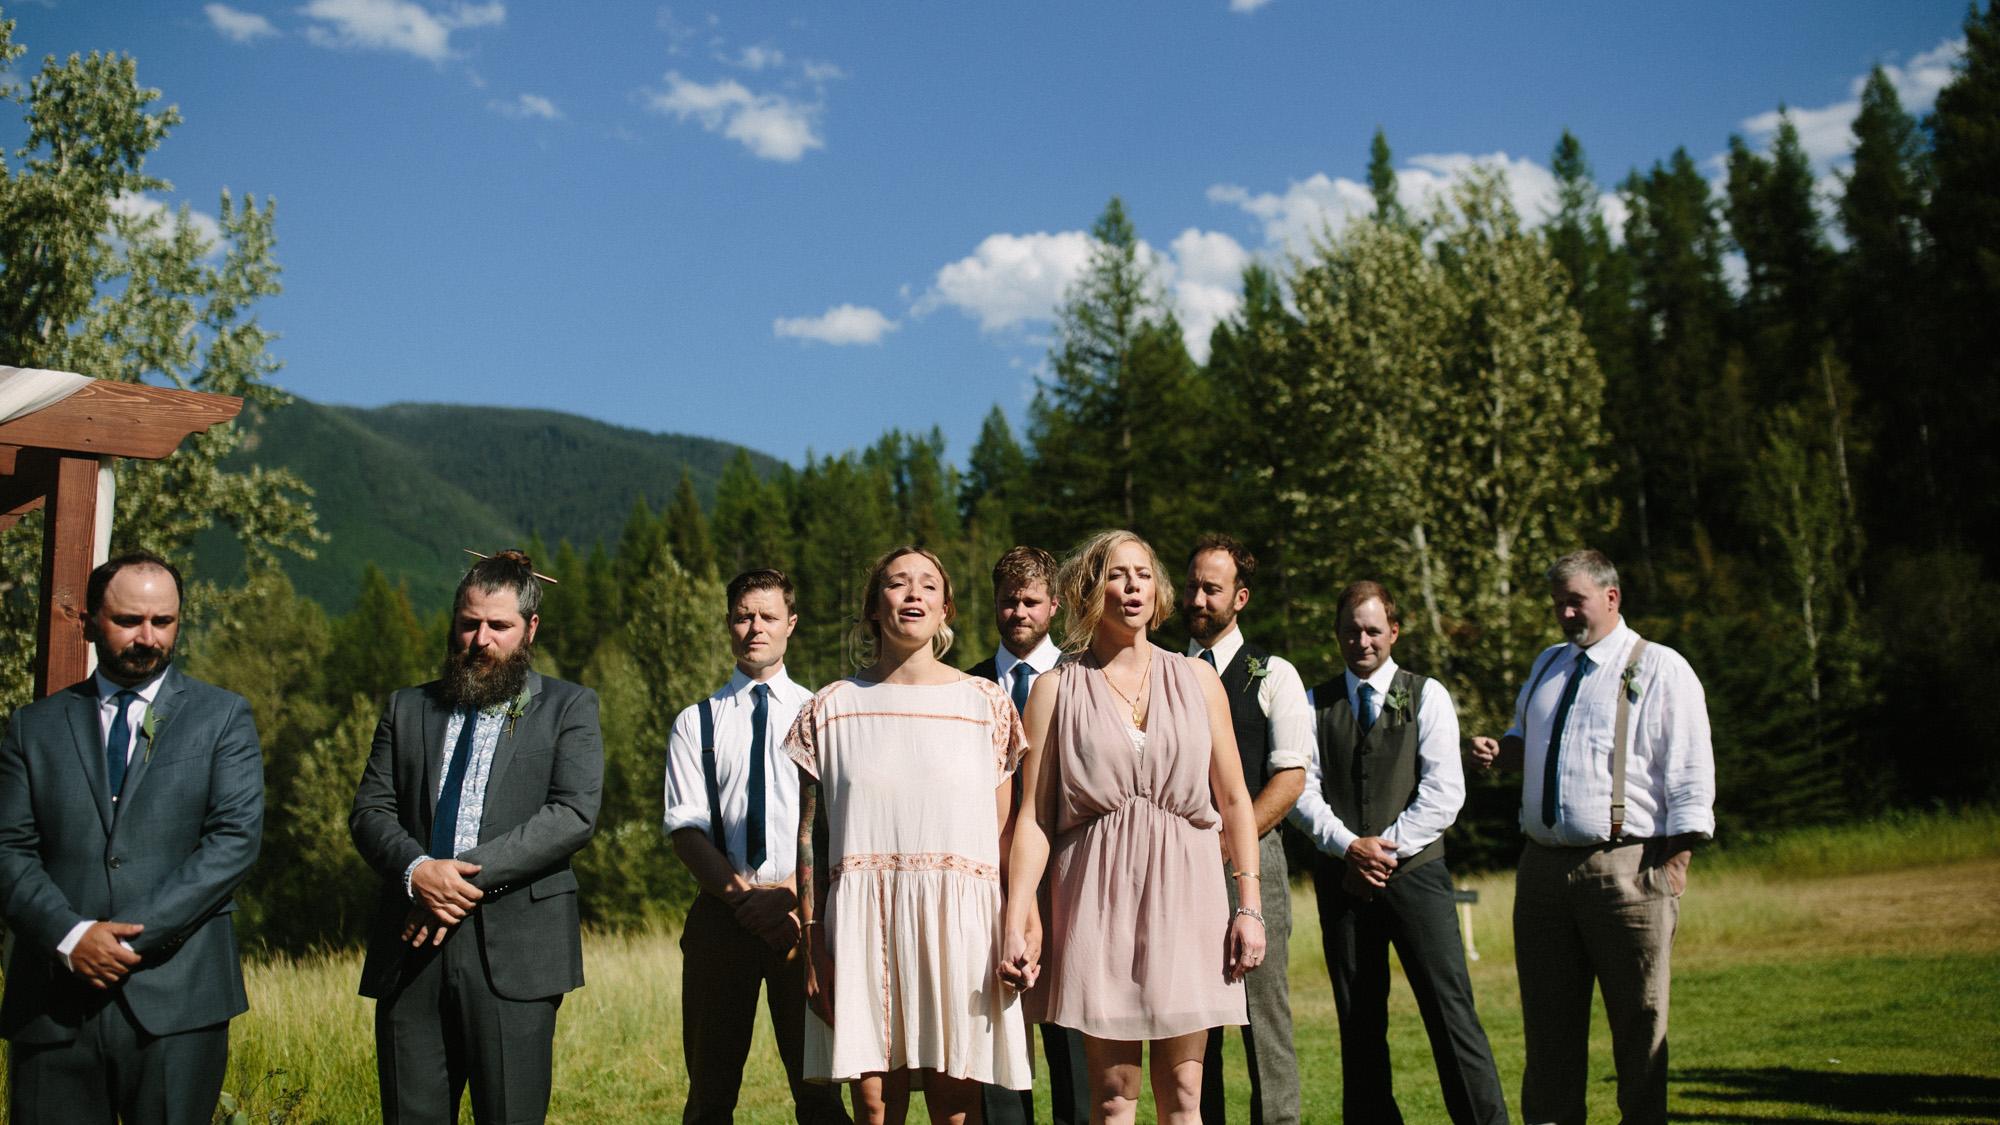 Montana_Wedding_Photos_alec_vanderboom-0087.jpg